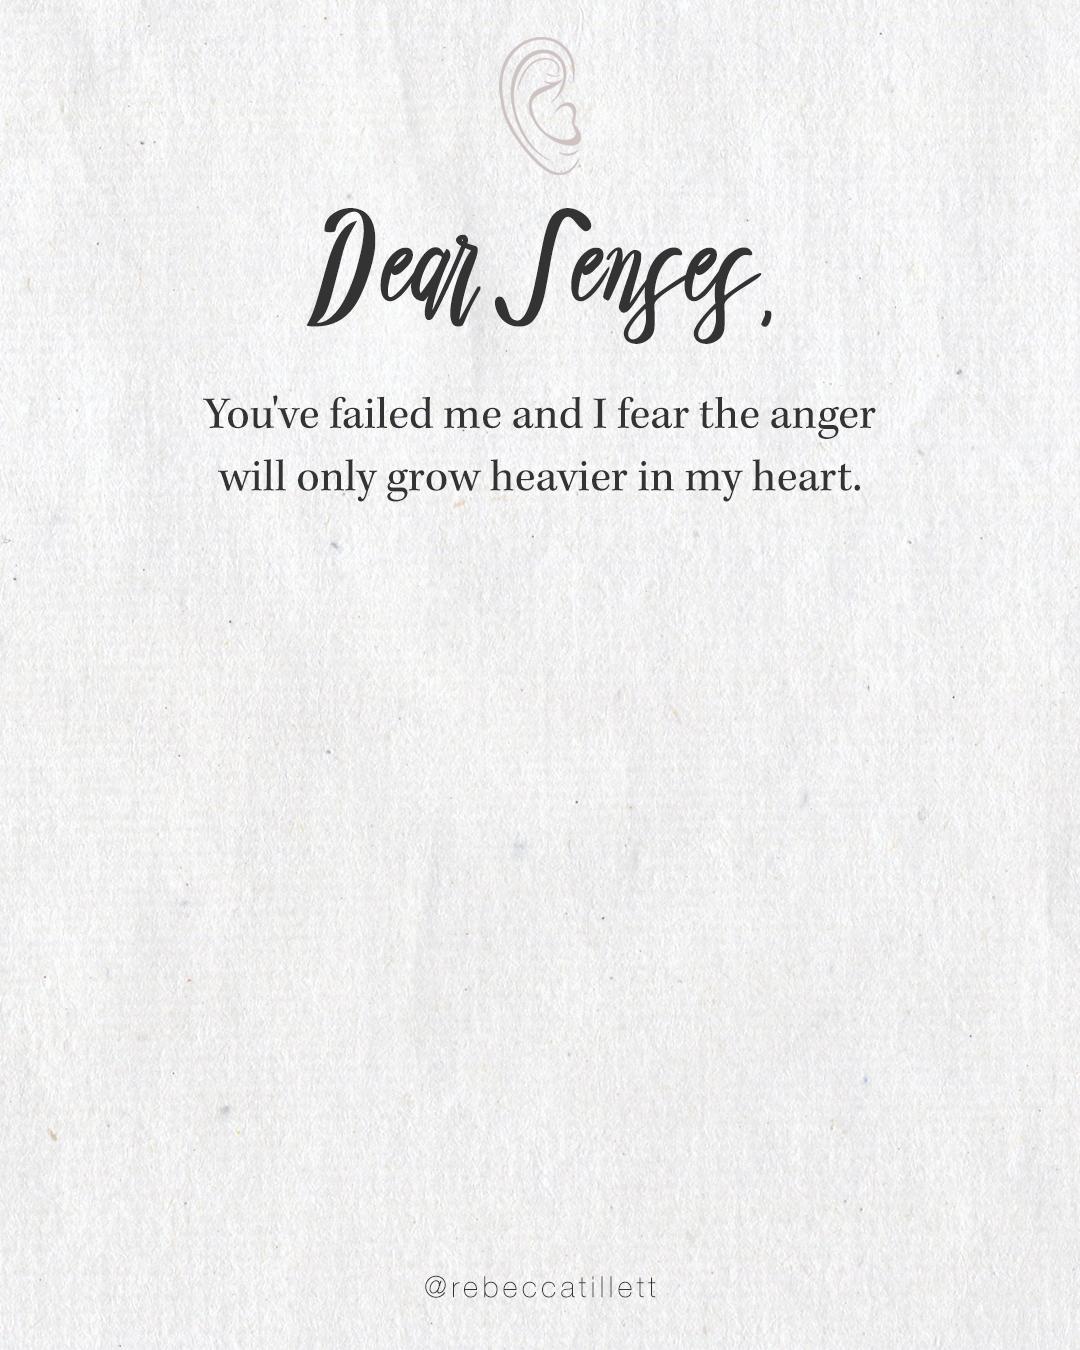 Dear Senses